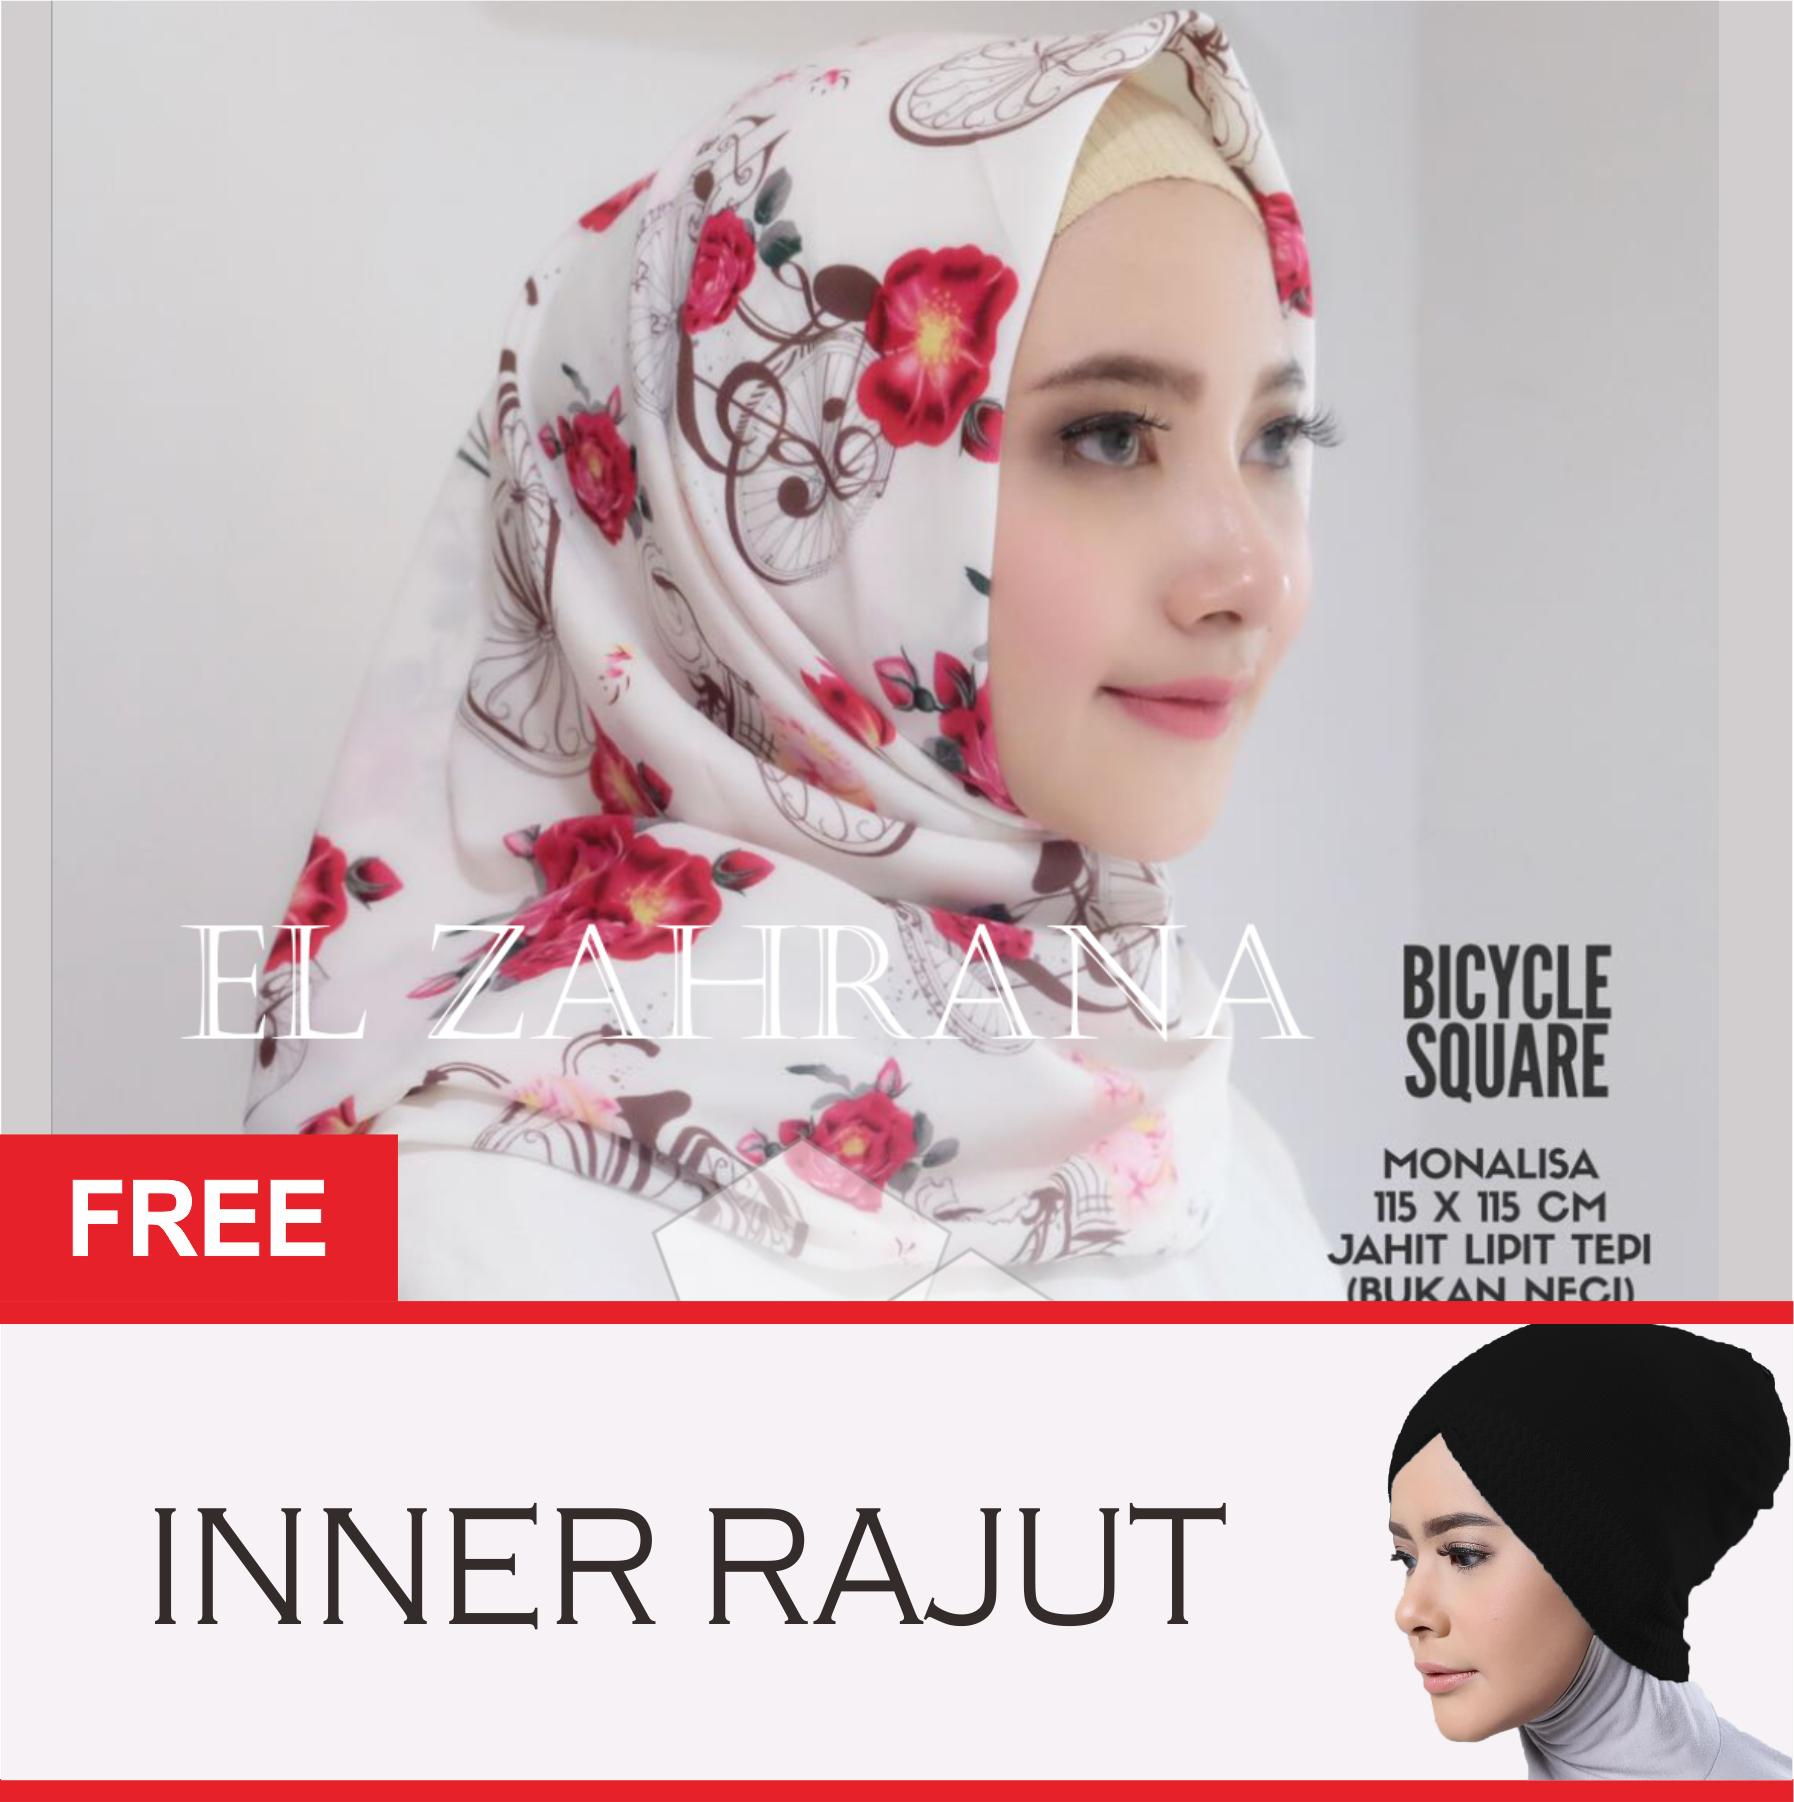 El Zahrana Kerudung Segi Empat - Hijab Segi Empat - Hijab Motif - Jilbab Segi Empat